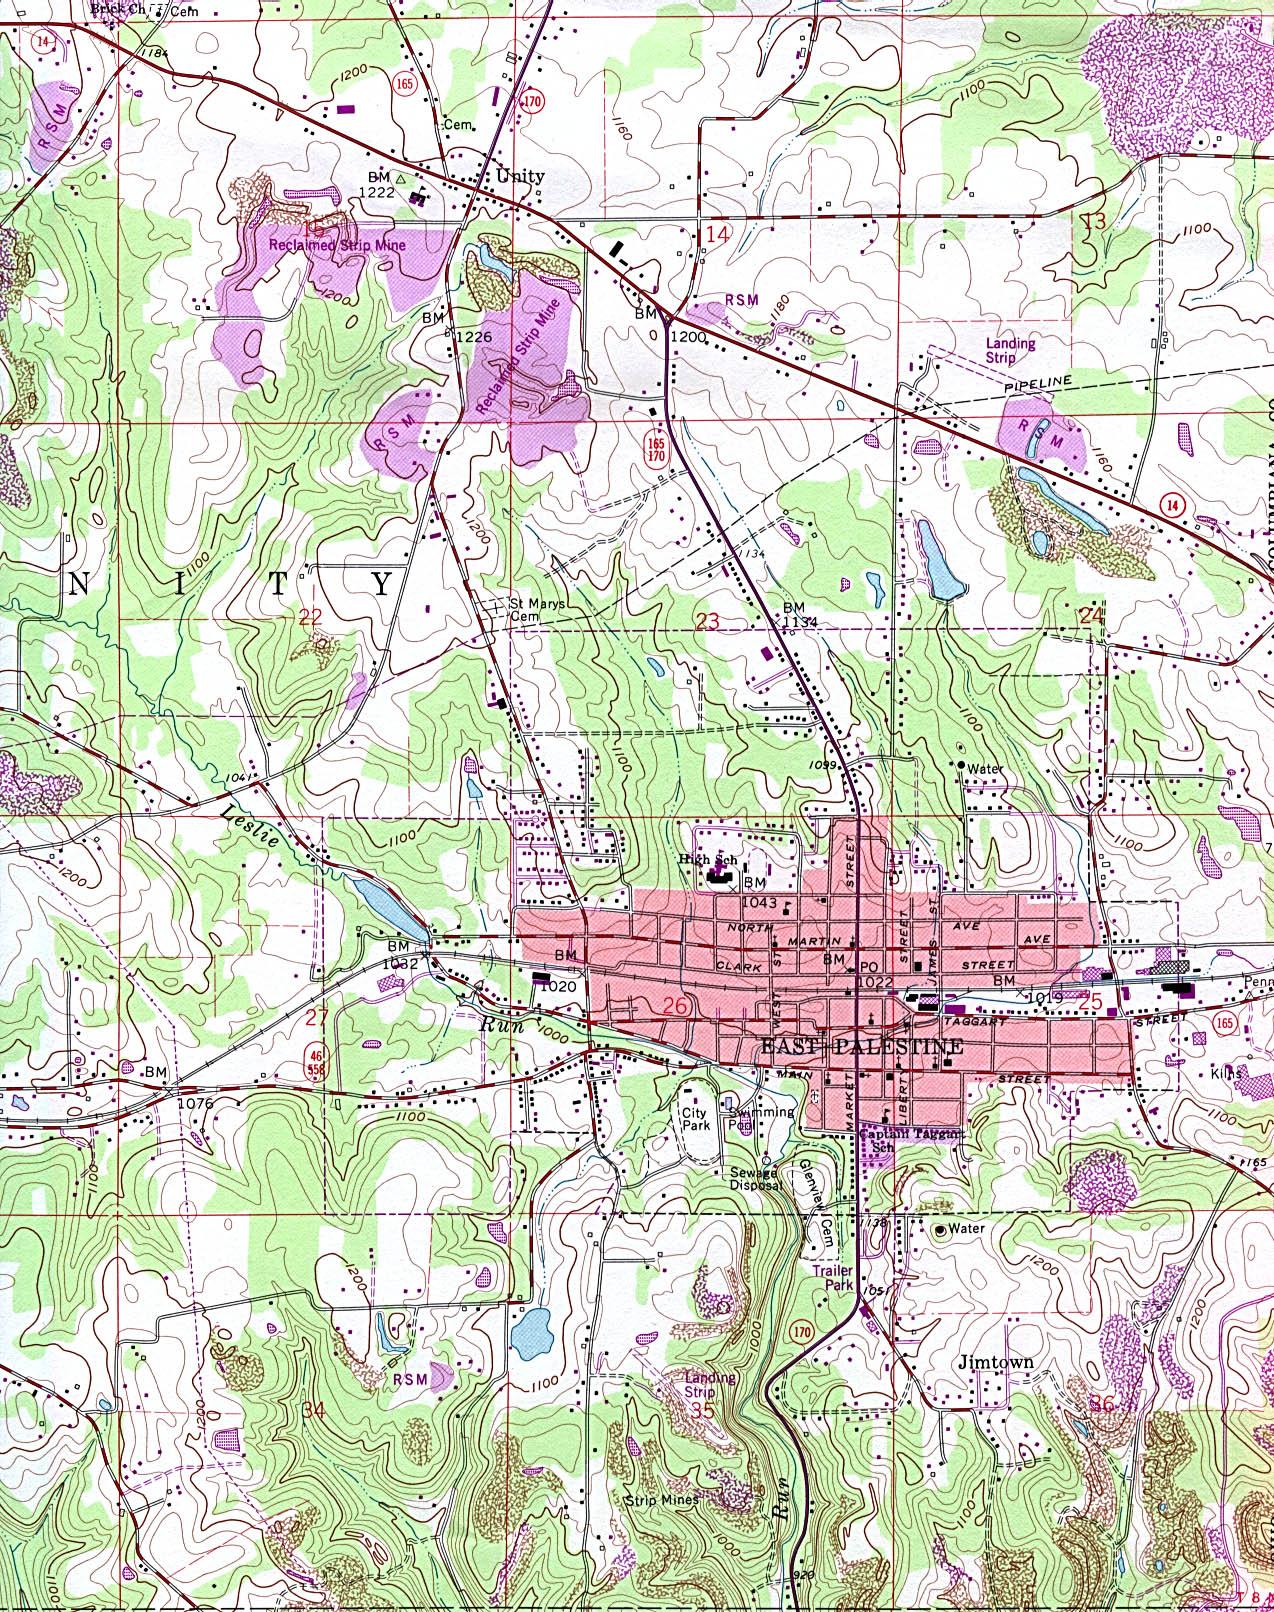 Maps of Ohio. East Palestine [Topographic Map] original scale 1:24,000 U.S.G.S. 1960, photorevised 1990 (791K)